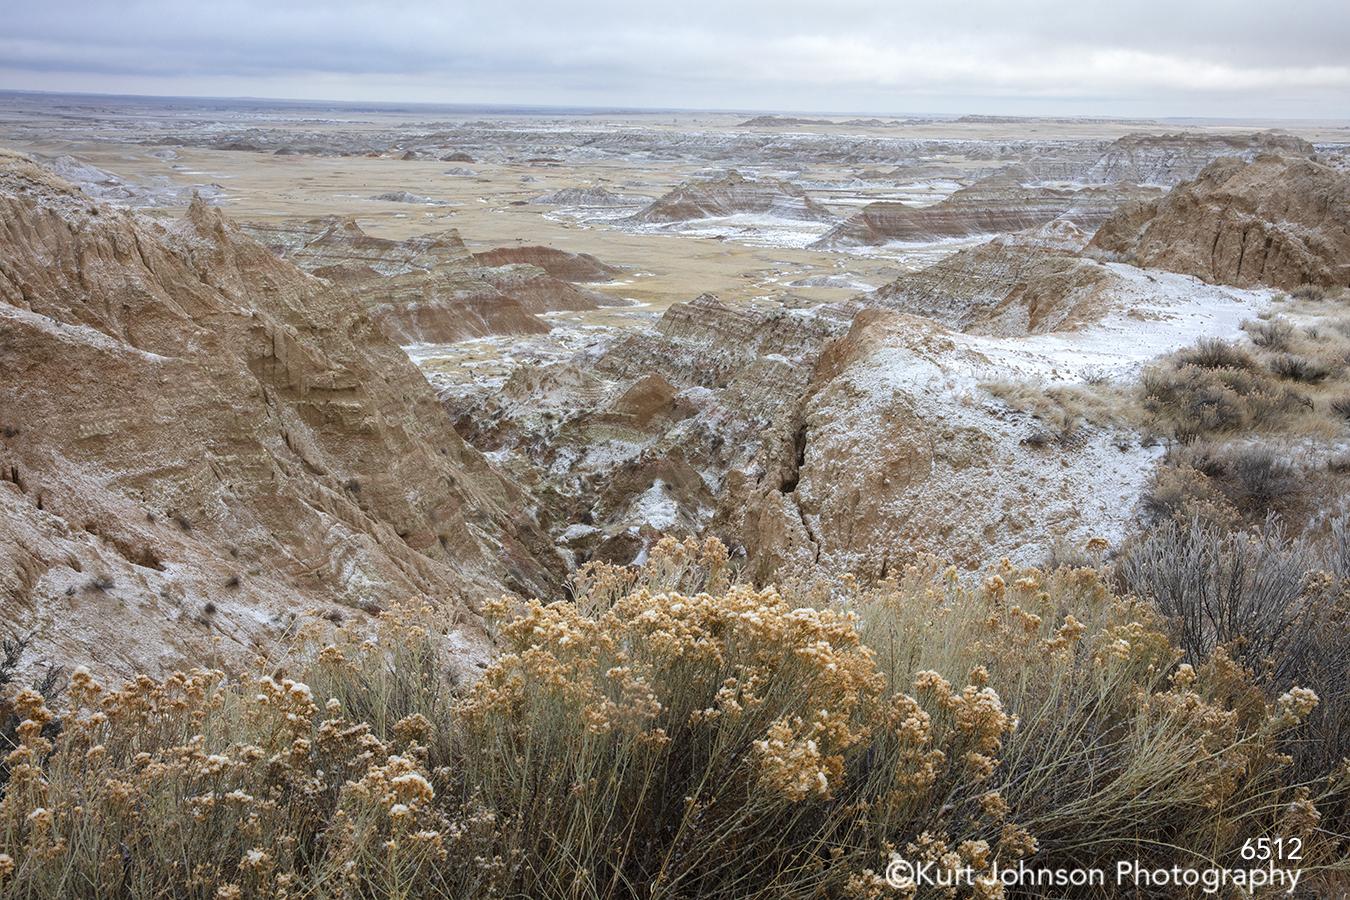 Badlands South Dakota Dakotas mountains grass grasses landscape brown tan beige snow winter yellow